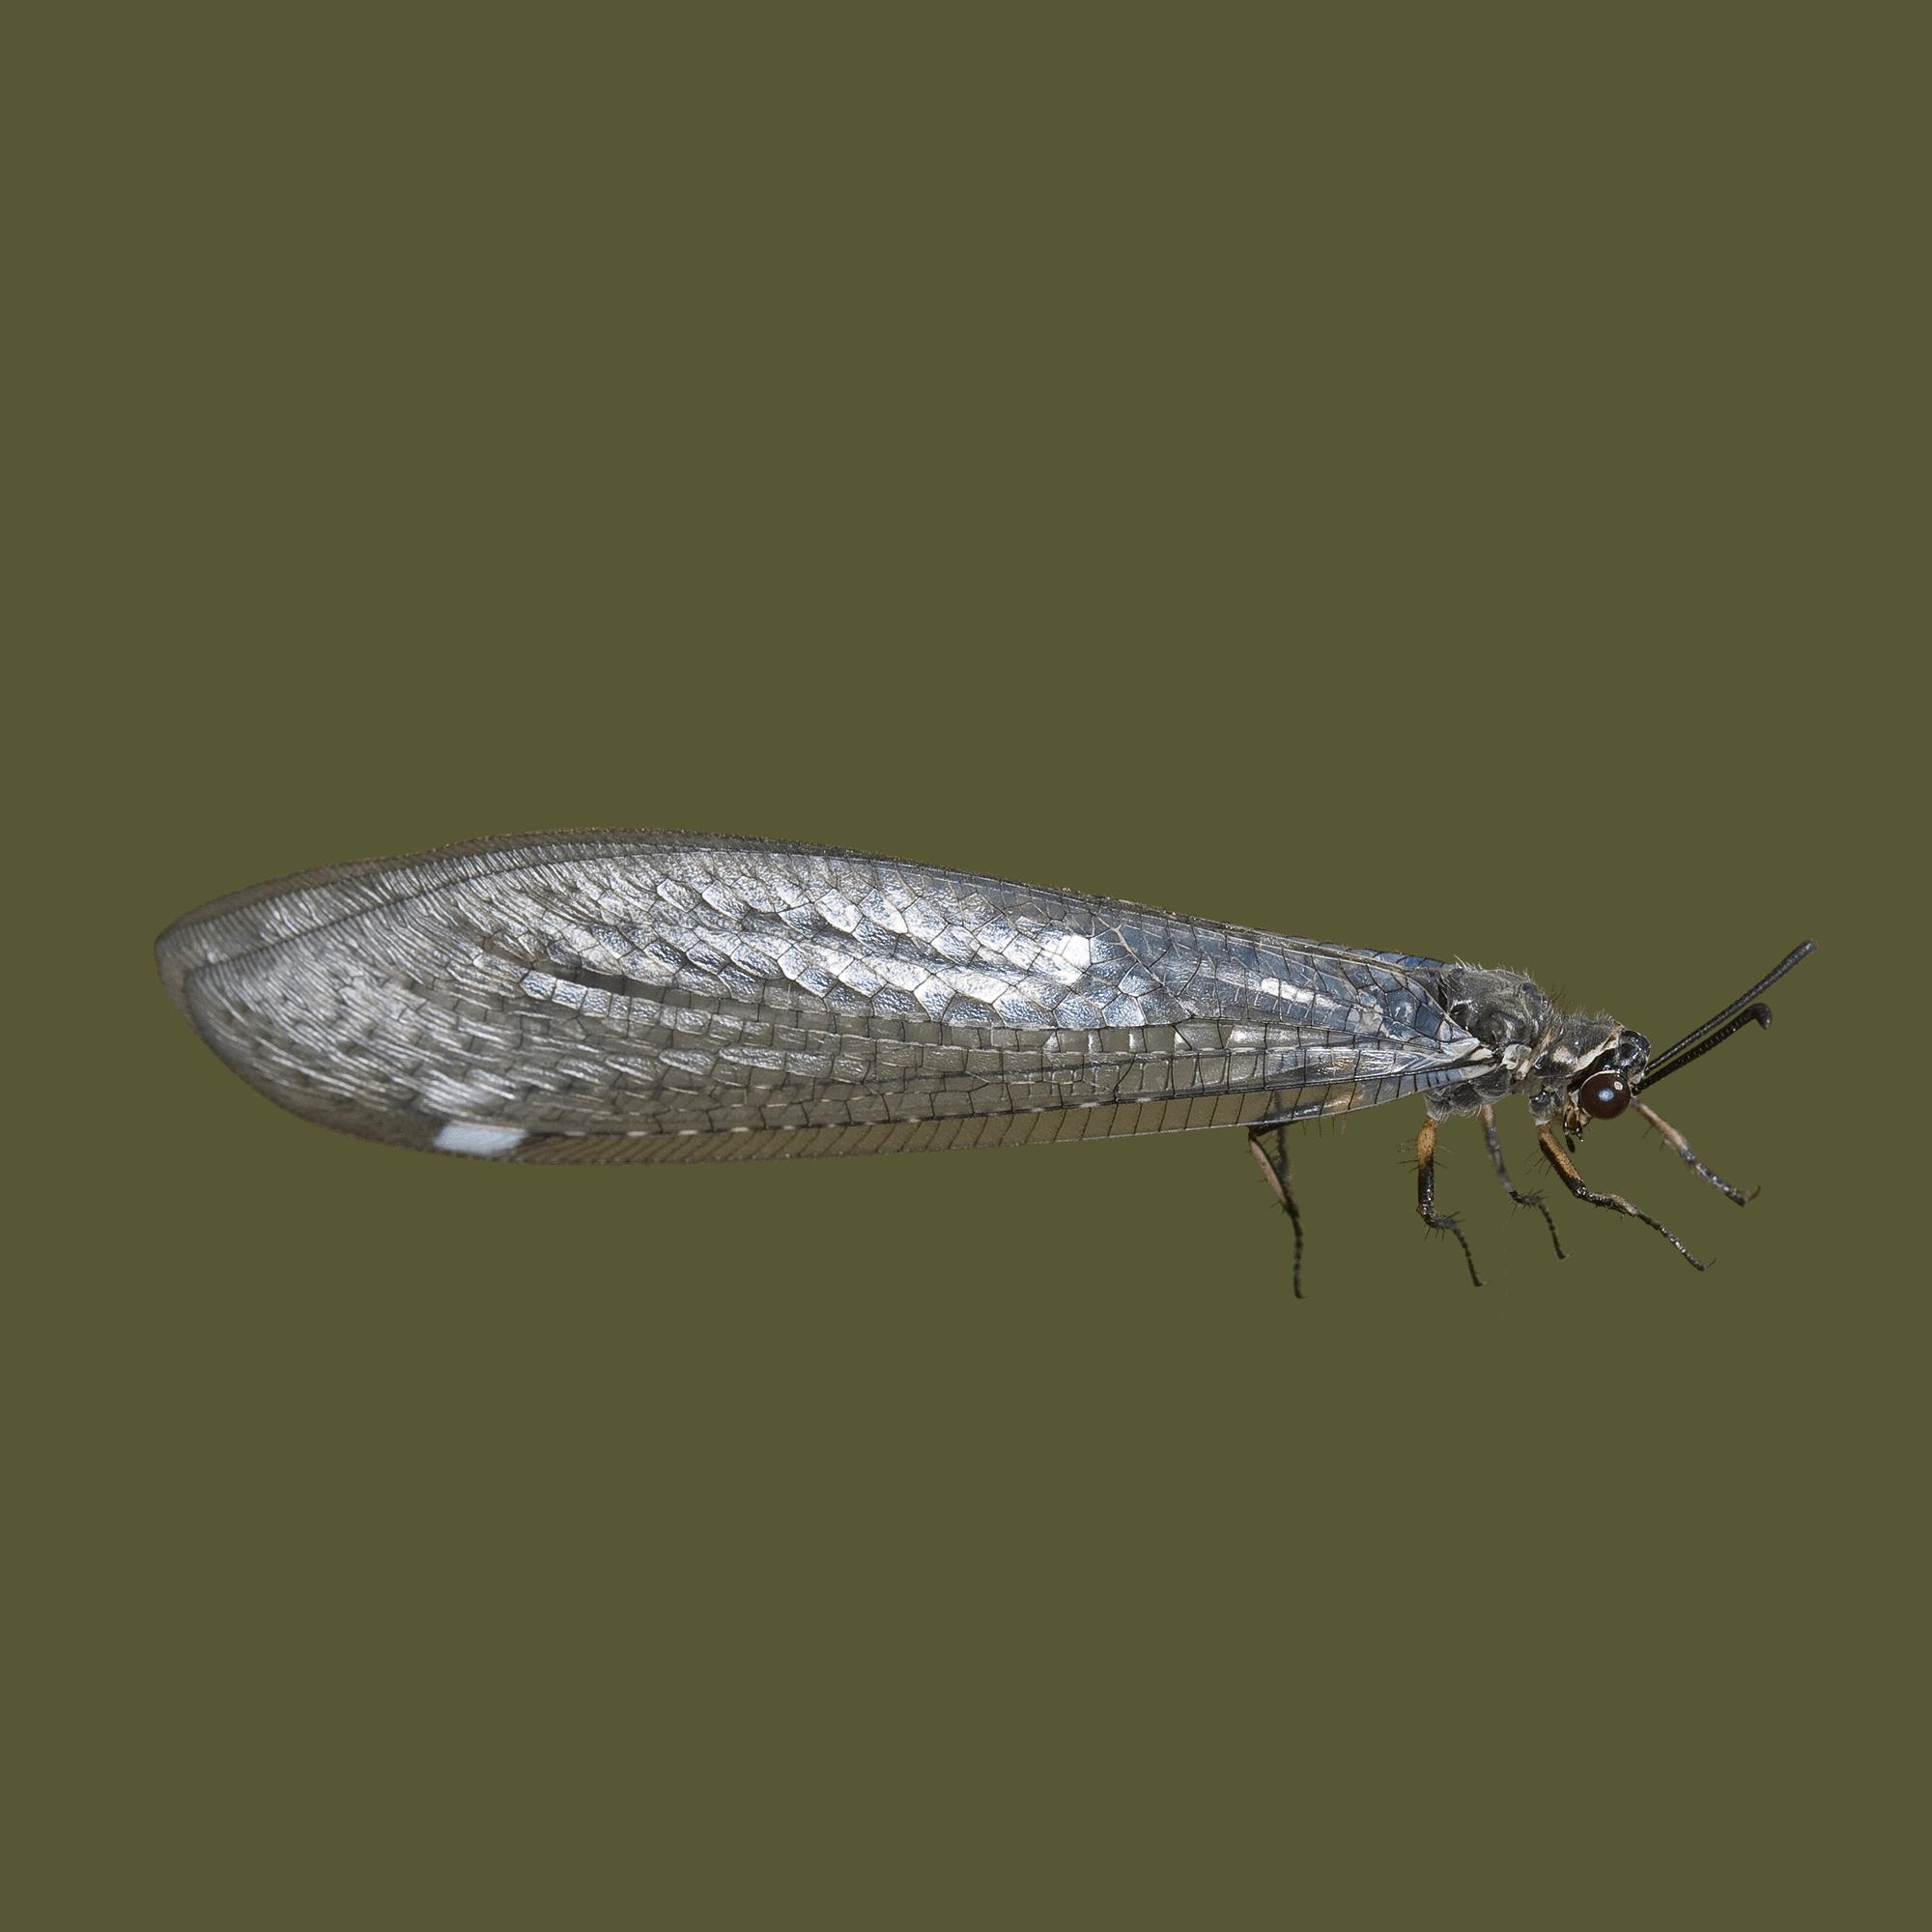 Ameisenjungfer 8